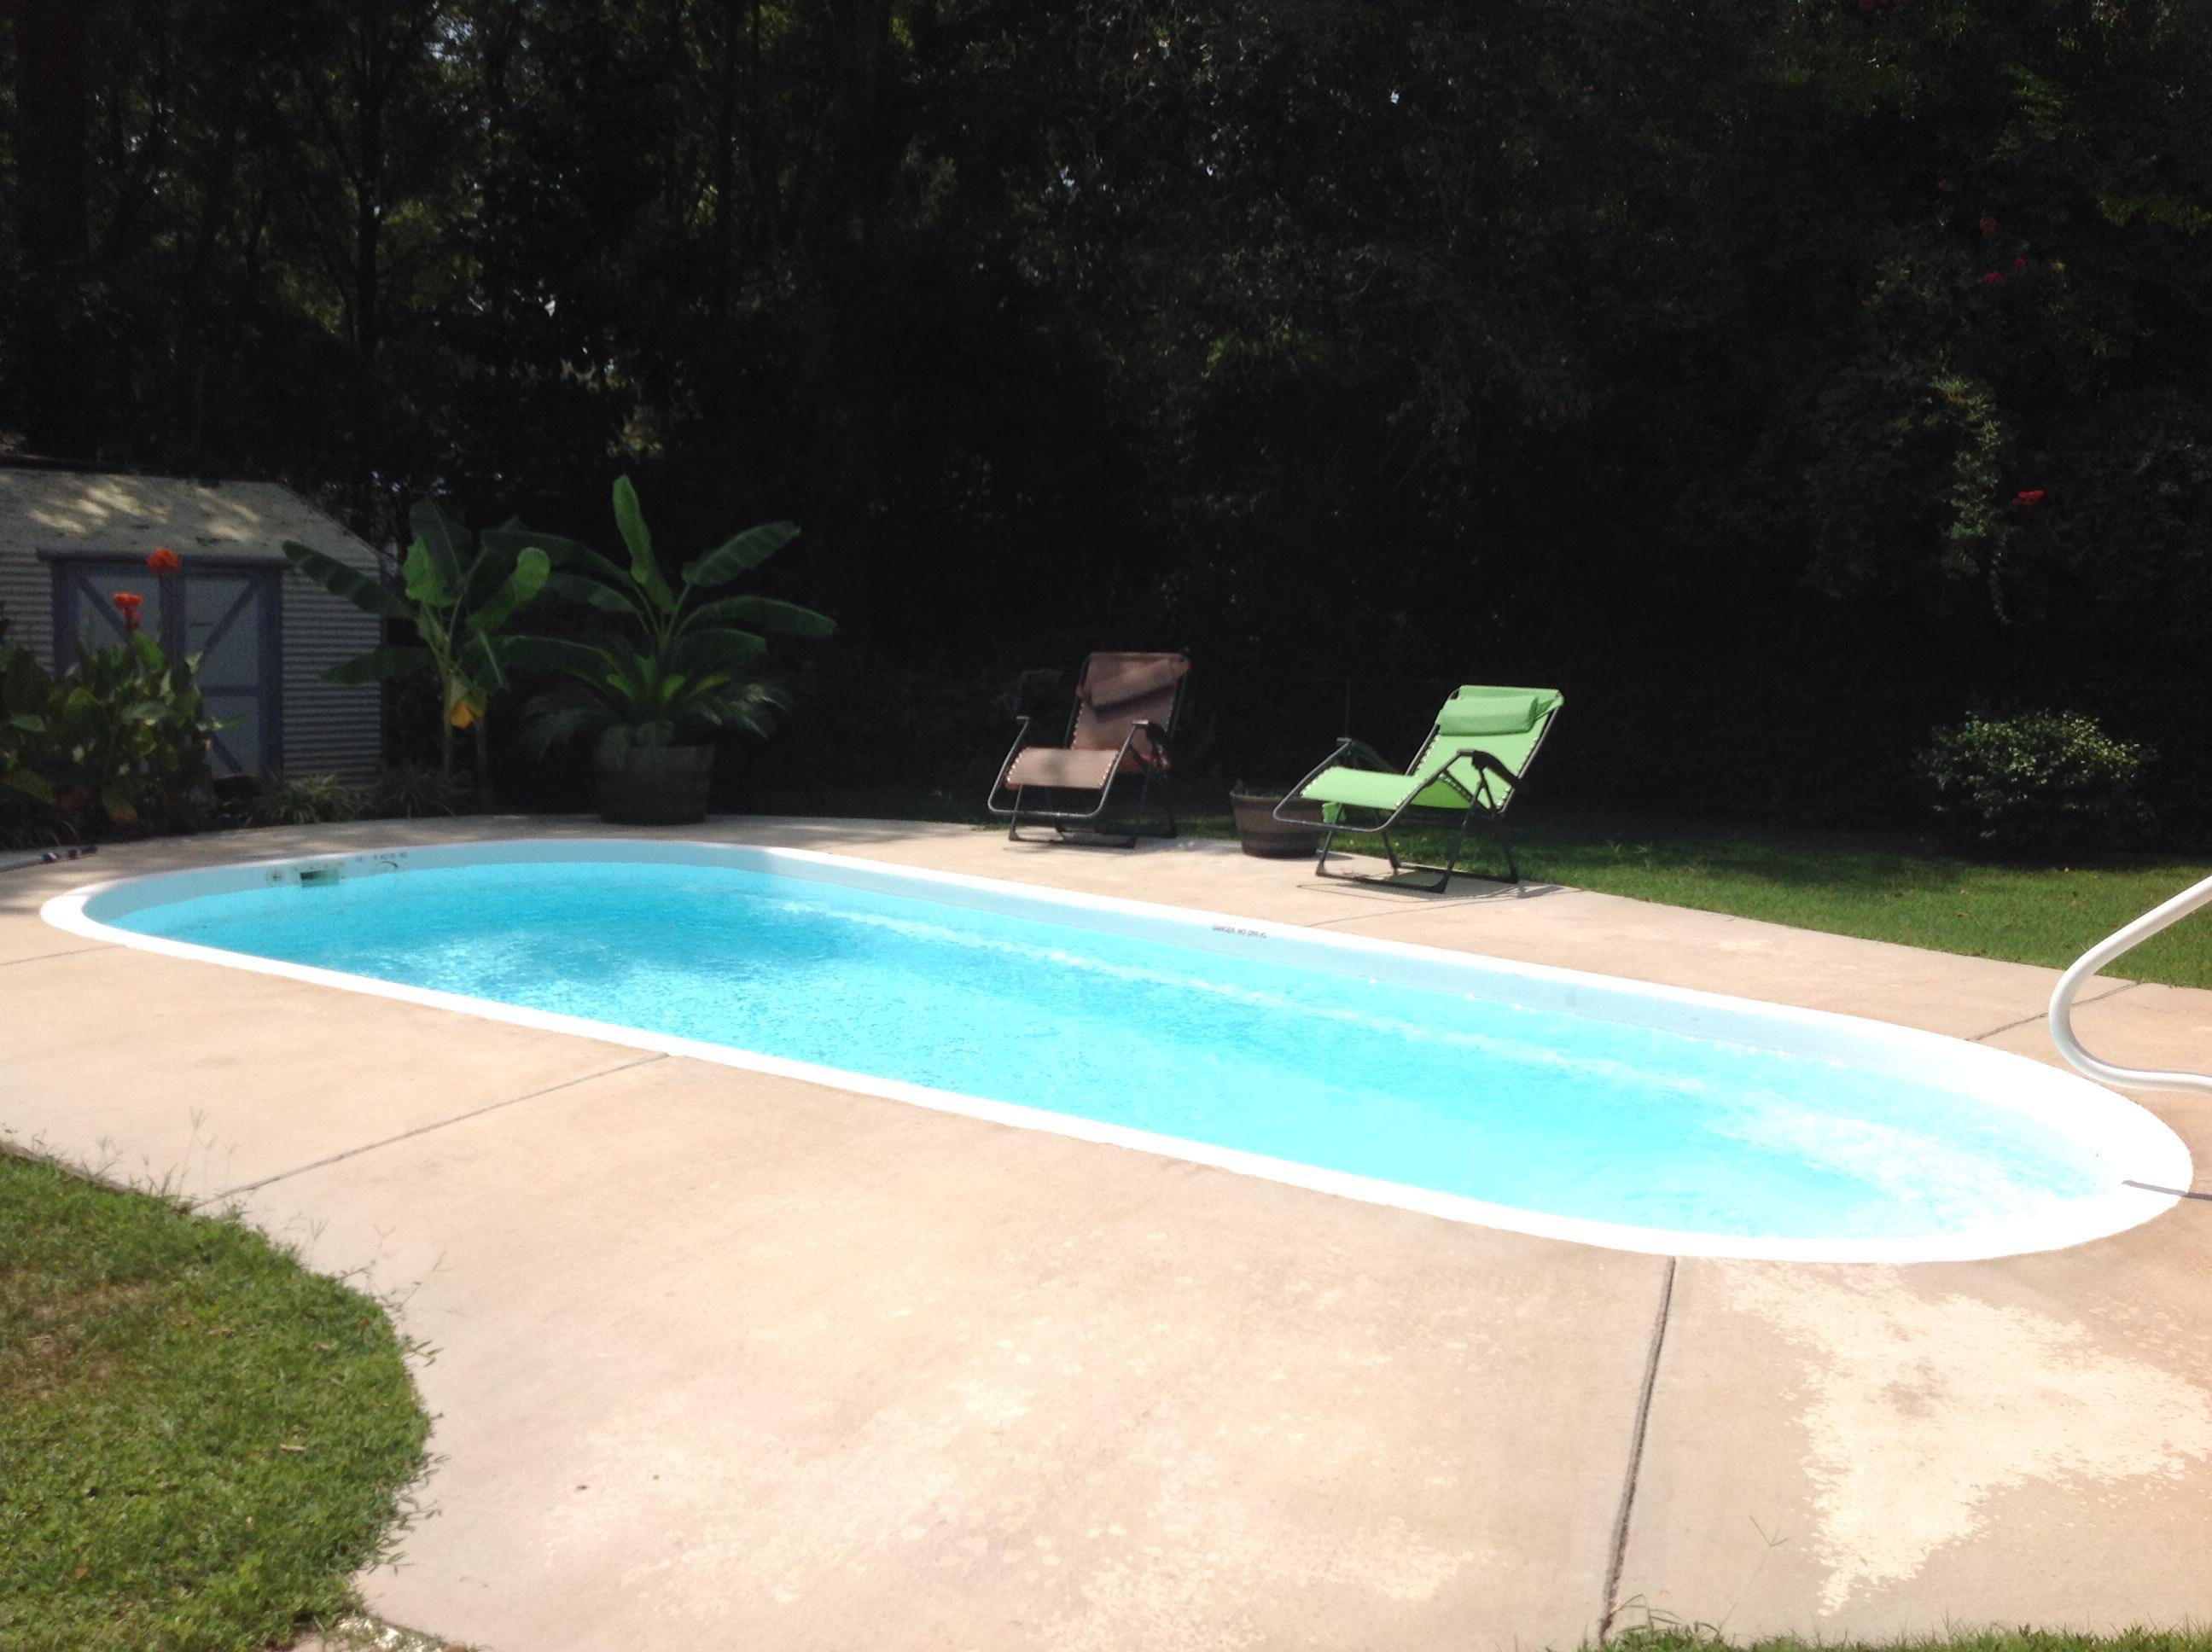 Belvedere II Homes For Sale - 122 Dogwood, Eutawville, SC - 4